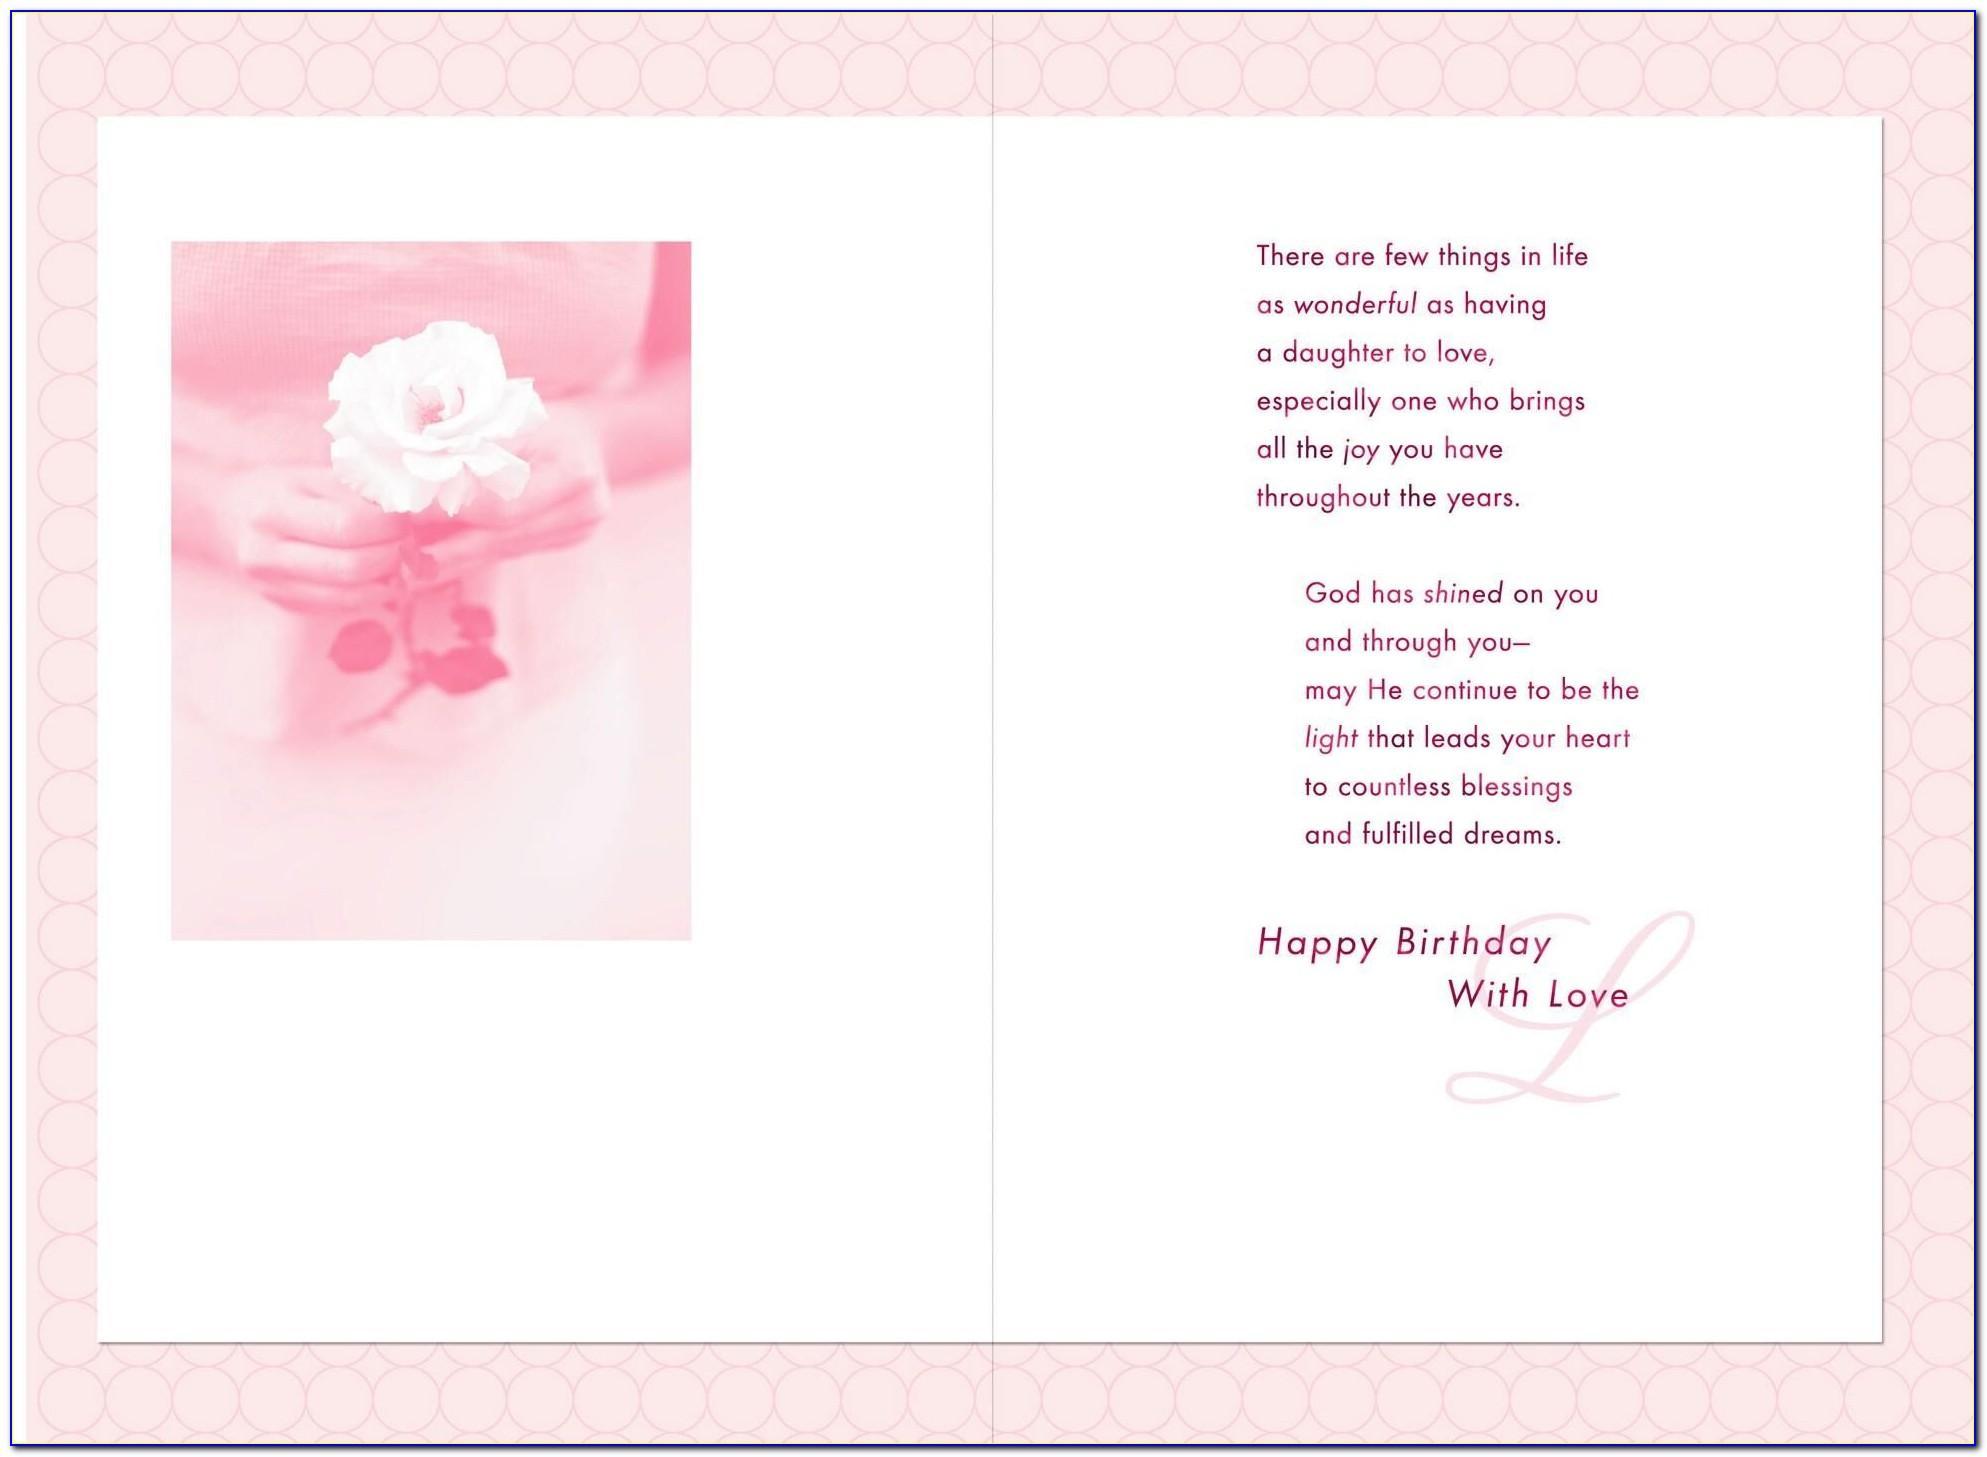 Hallmark Birthday Cards Online